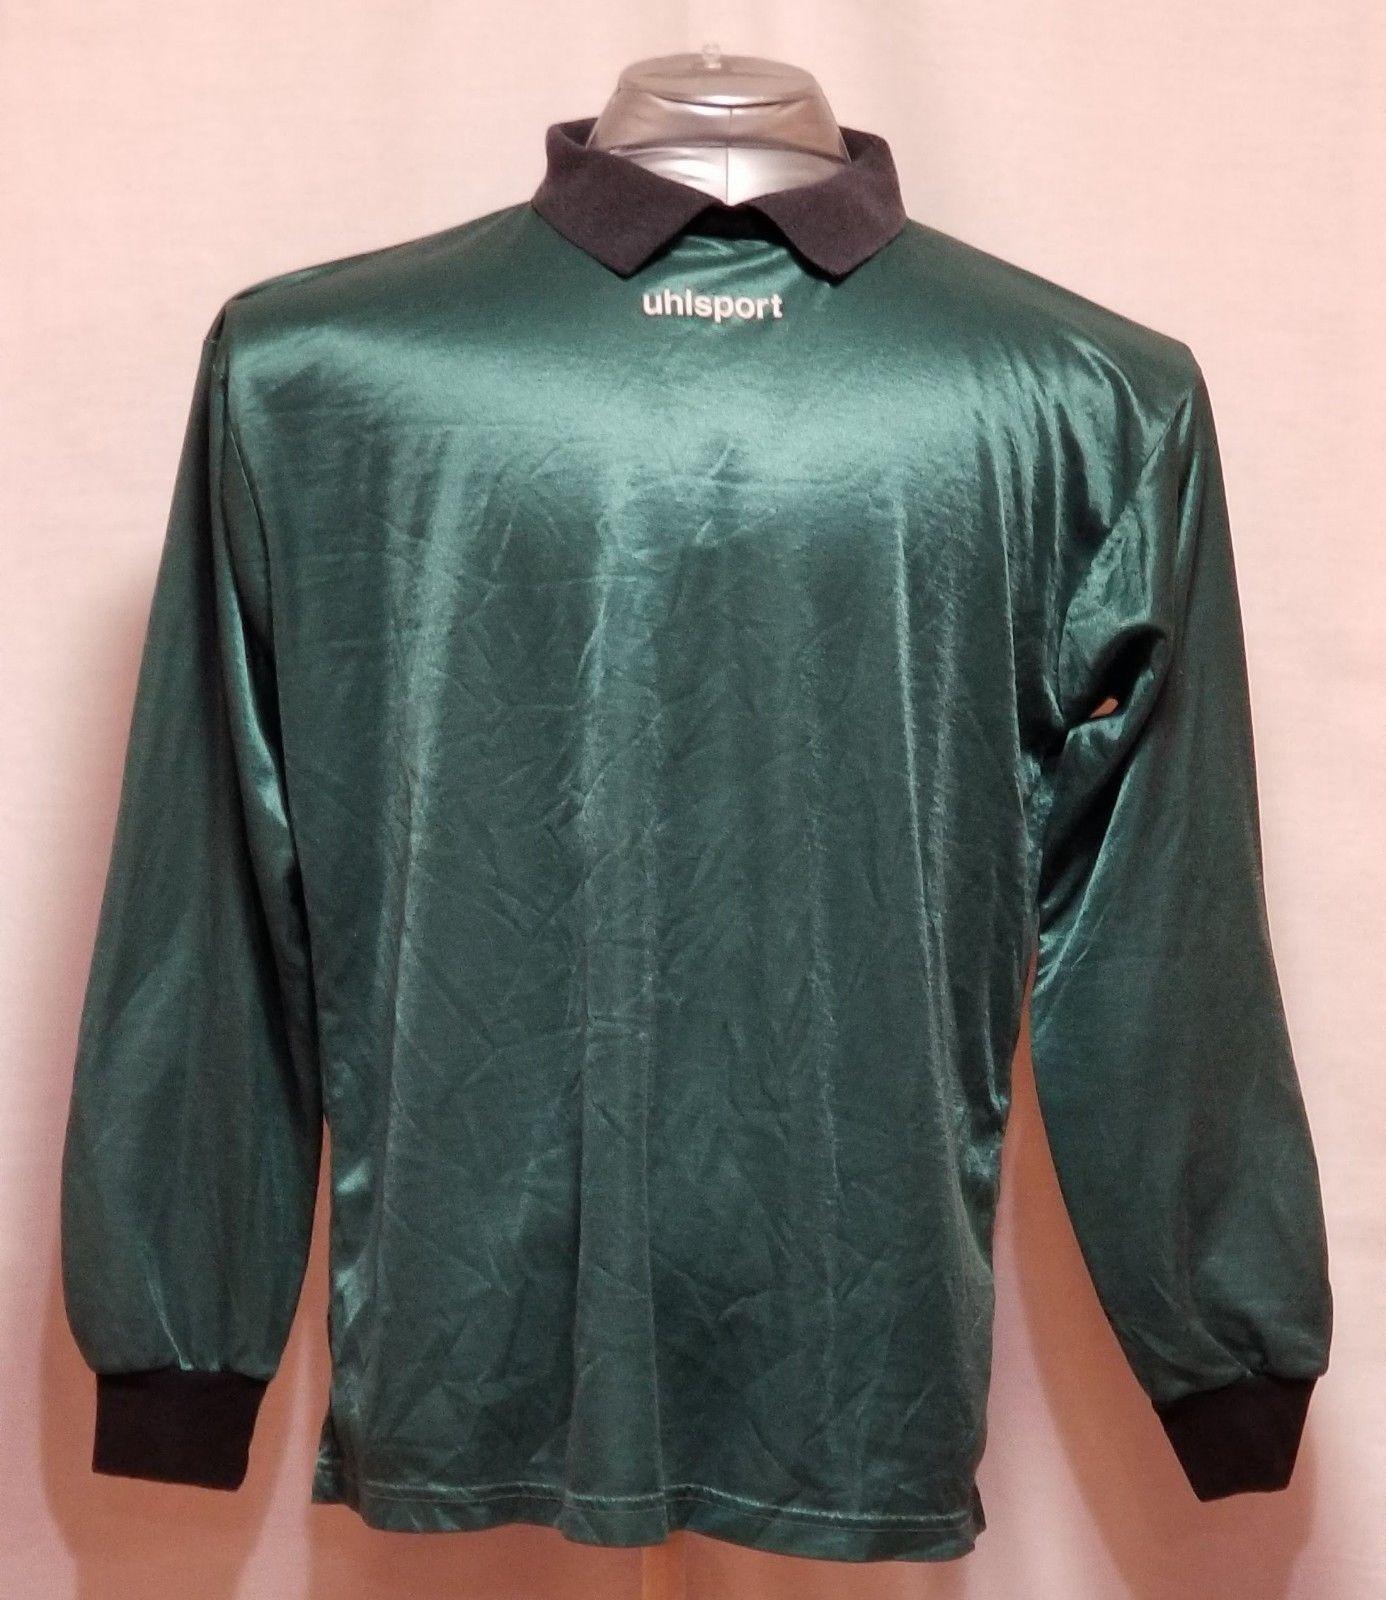 f9f1c0a730e Uhlsport Classics Green & Black Goalkeeper and similar items